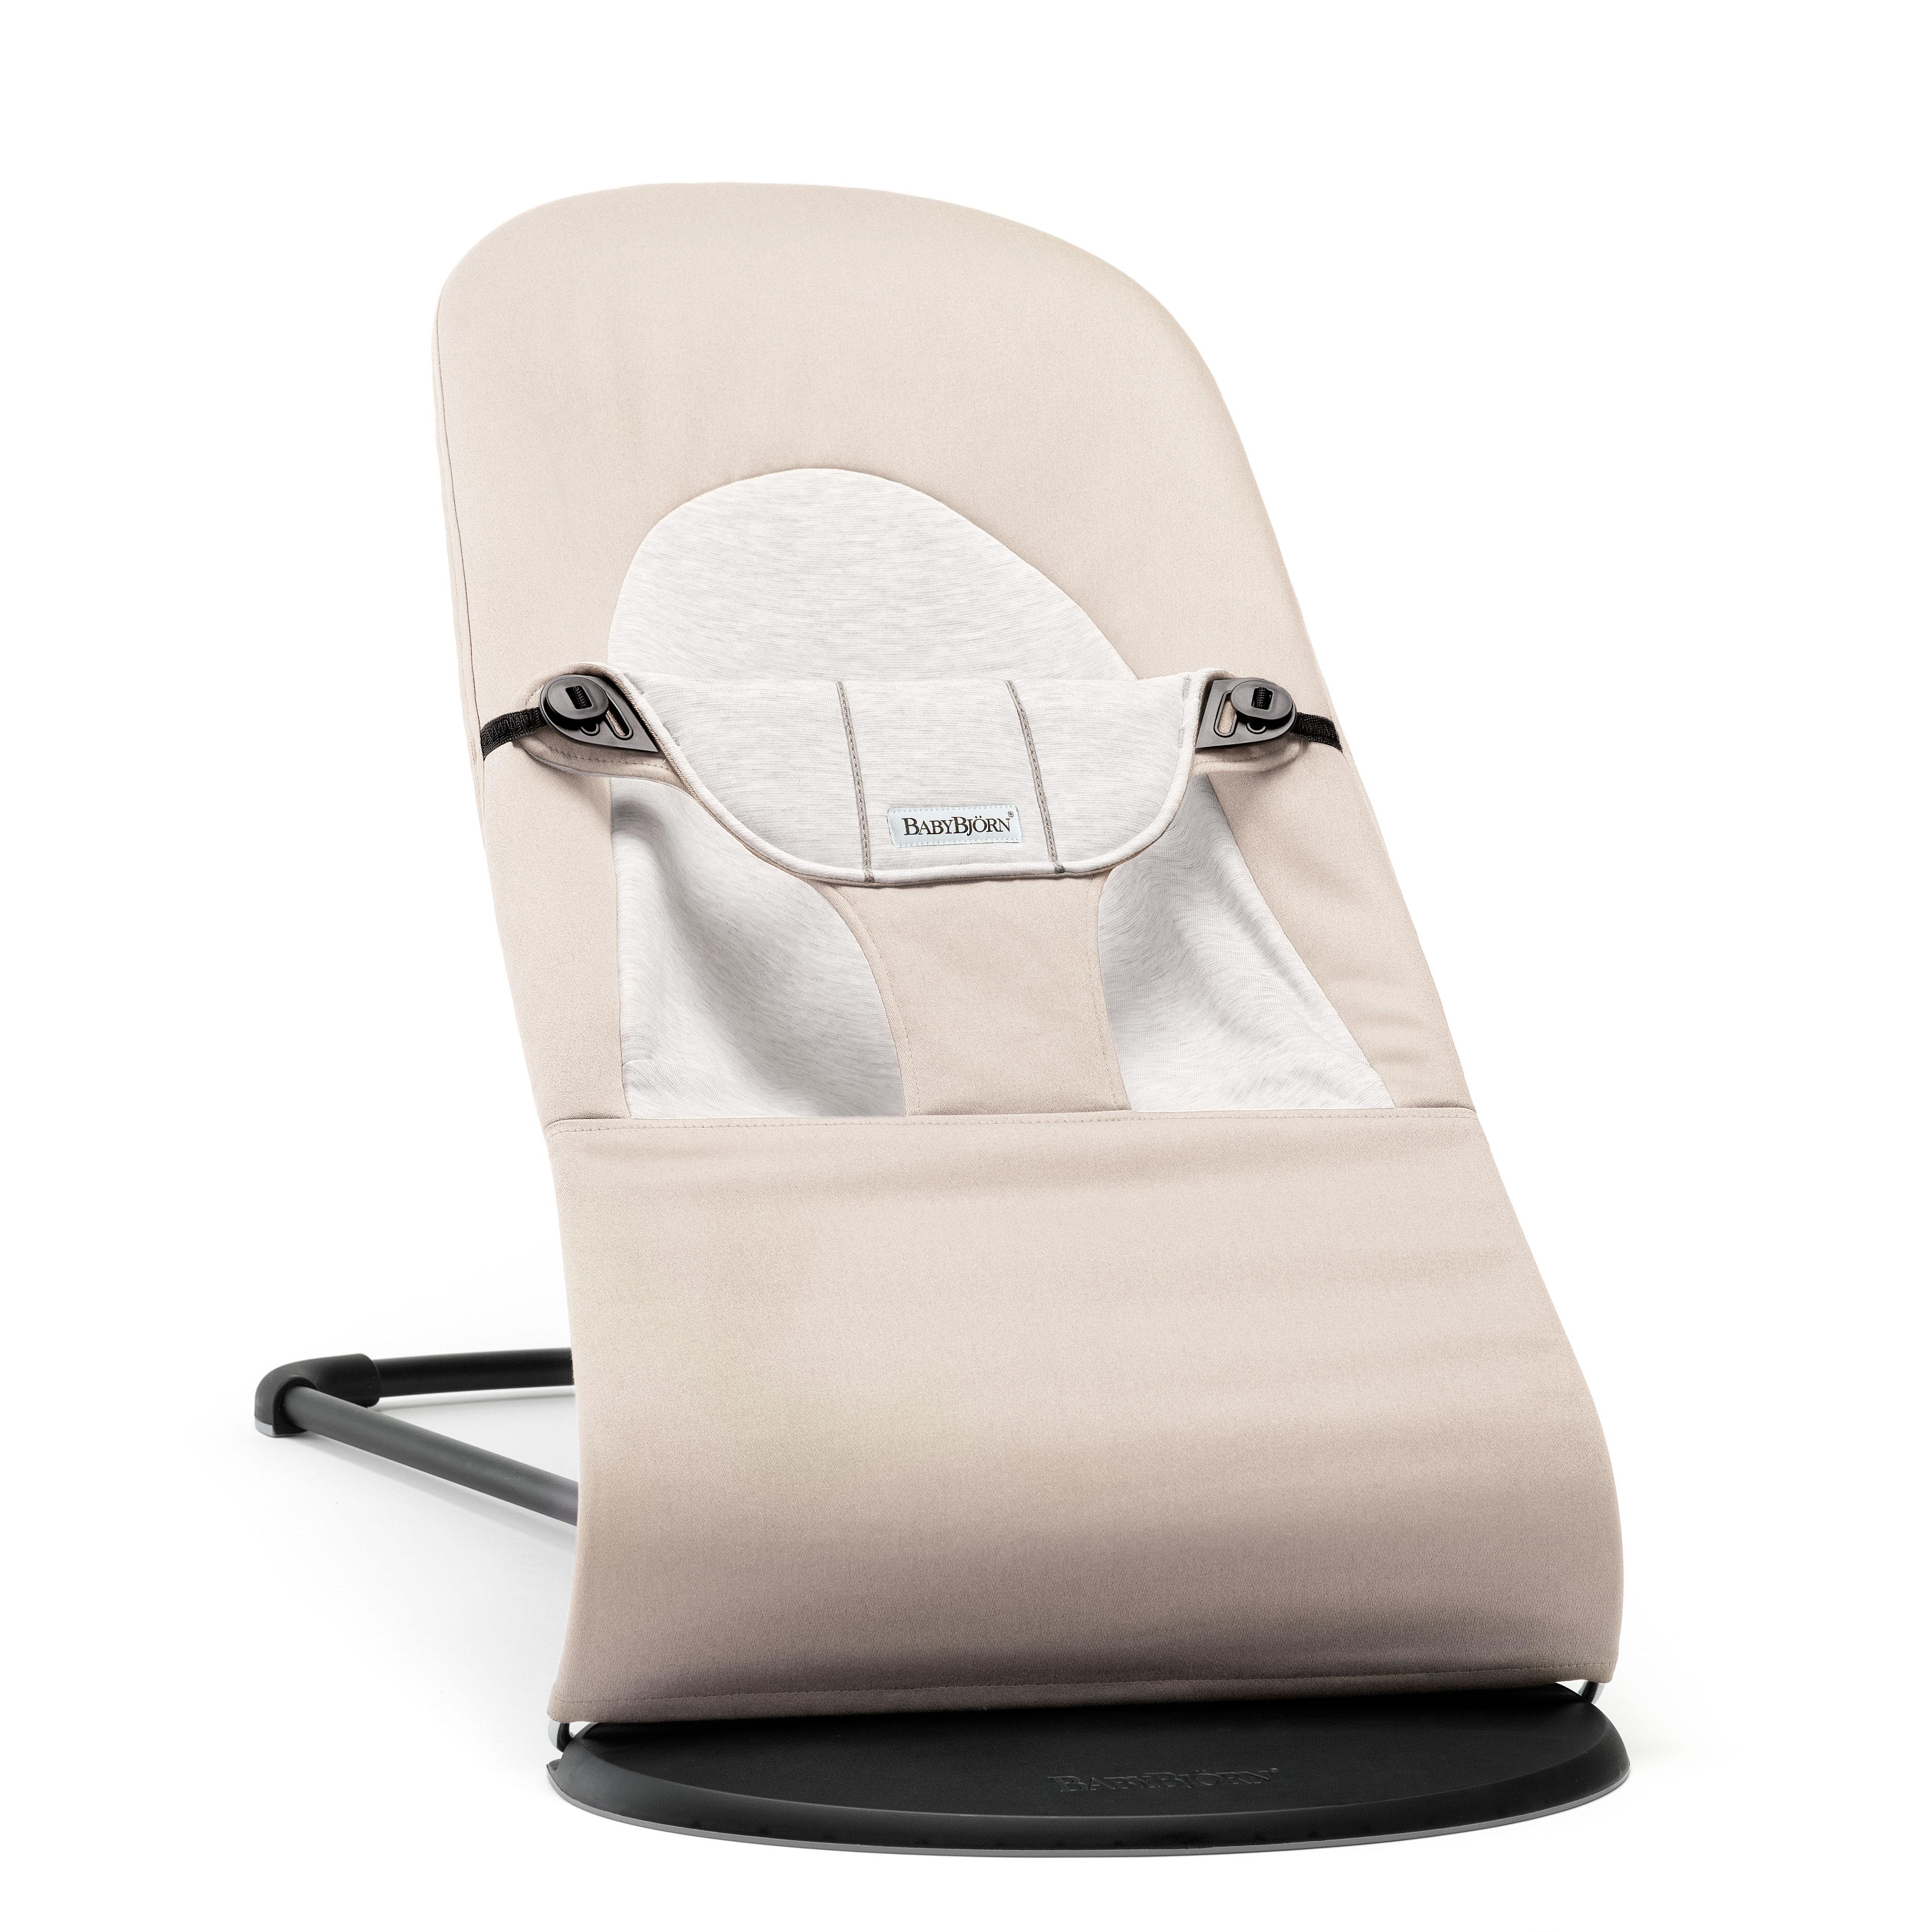 Image of   Babybjörn skråstol - Balance Soft - Beige/lys grå